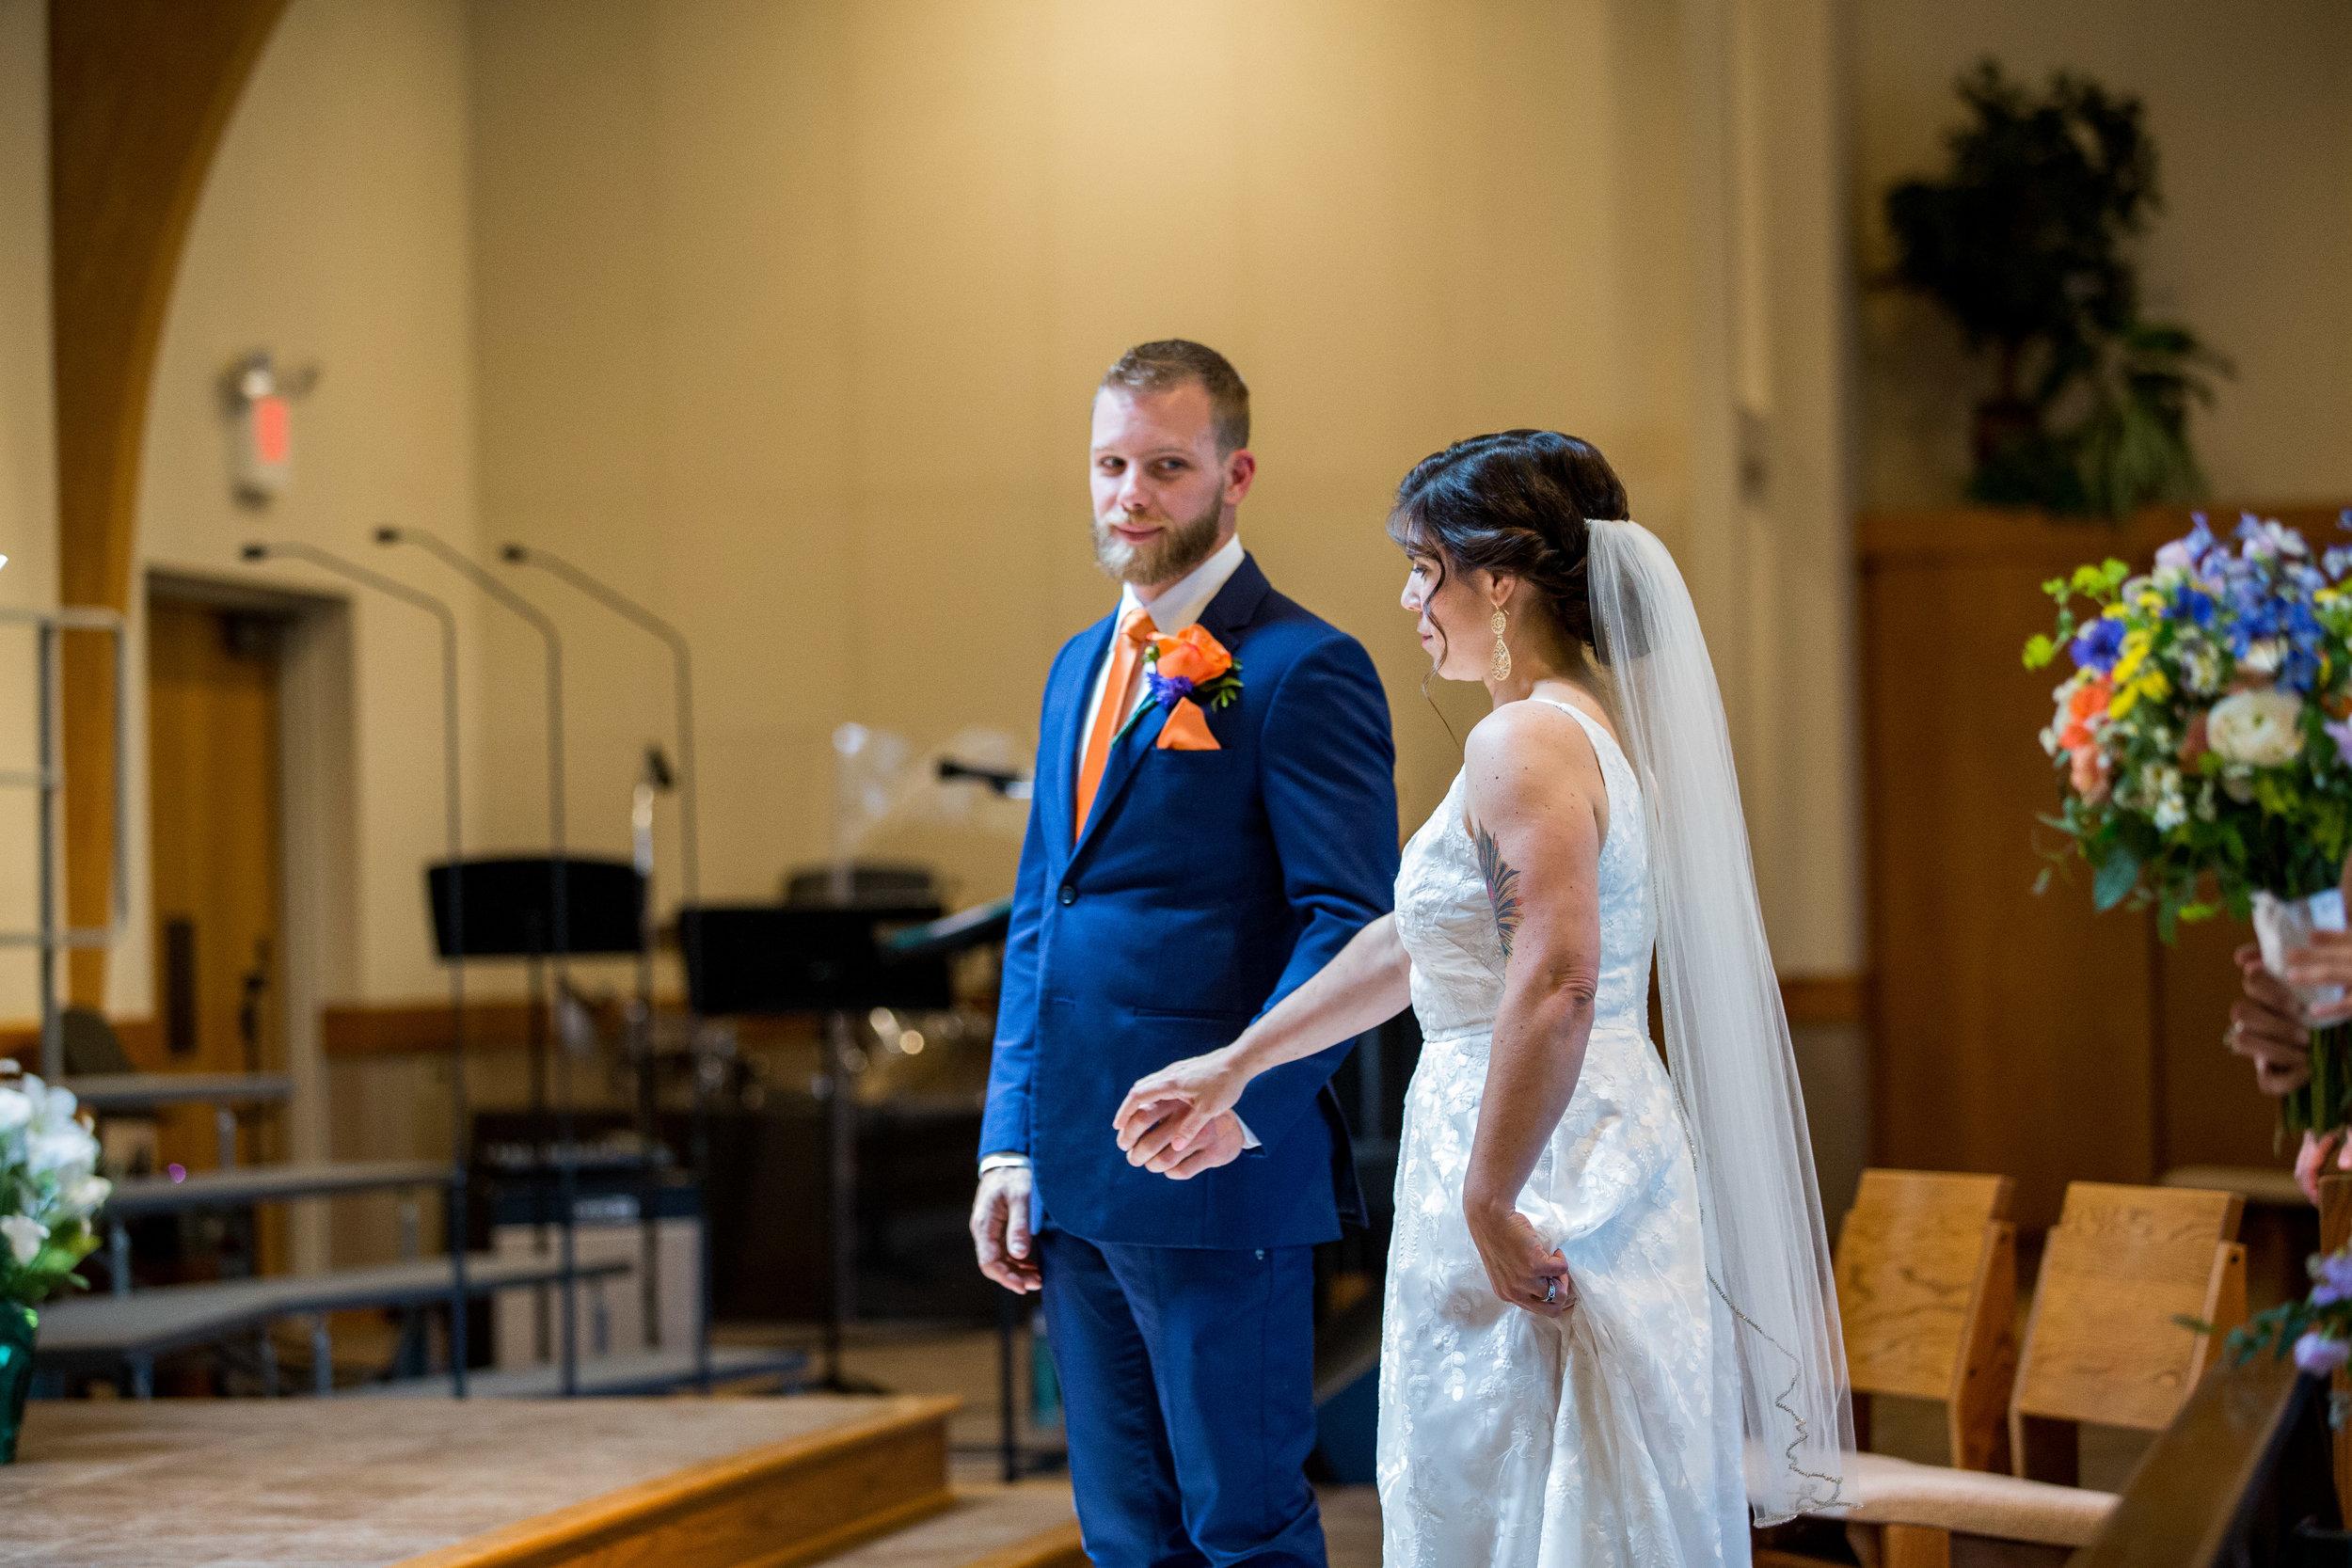 Natalie and Dallas Mooney Wedding 6-8-19_Tania Watt Photography-107.jpg